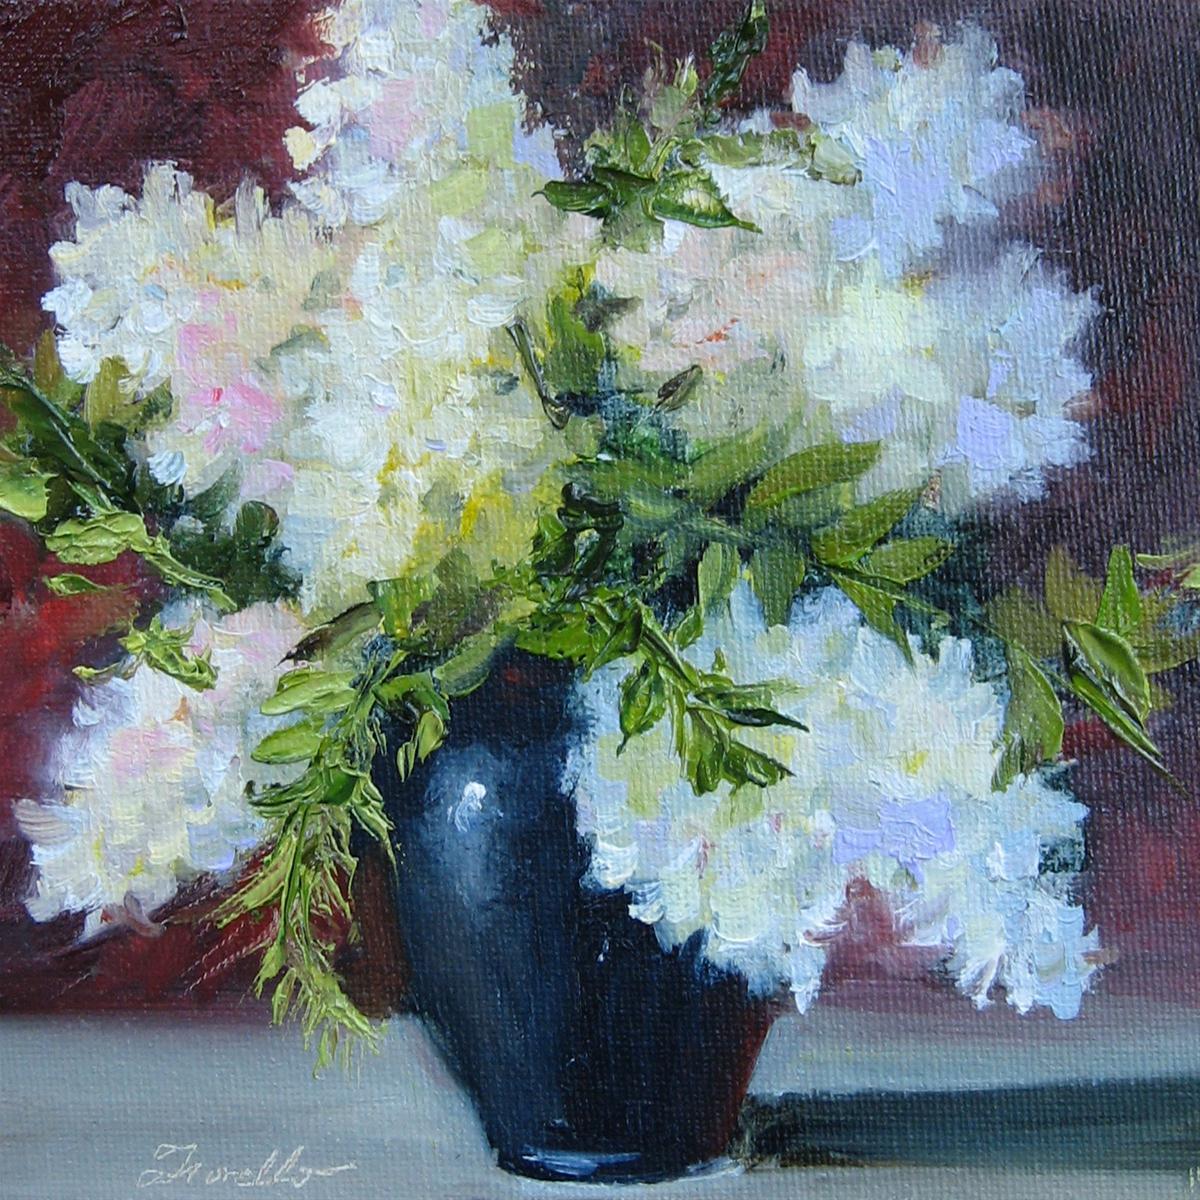 """Flower Study #25 White Hydrangeas"" original fine art by Pat Fiorello"